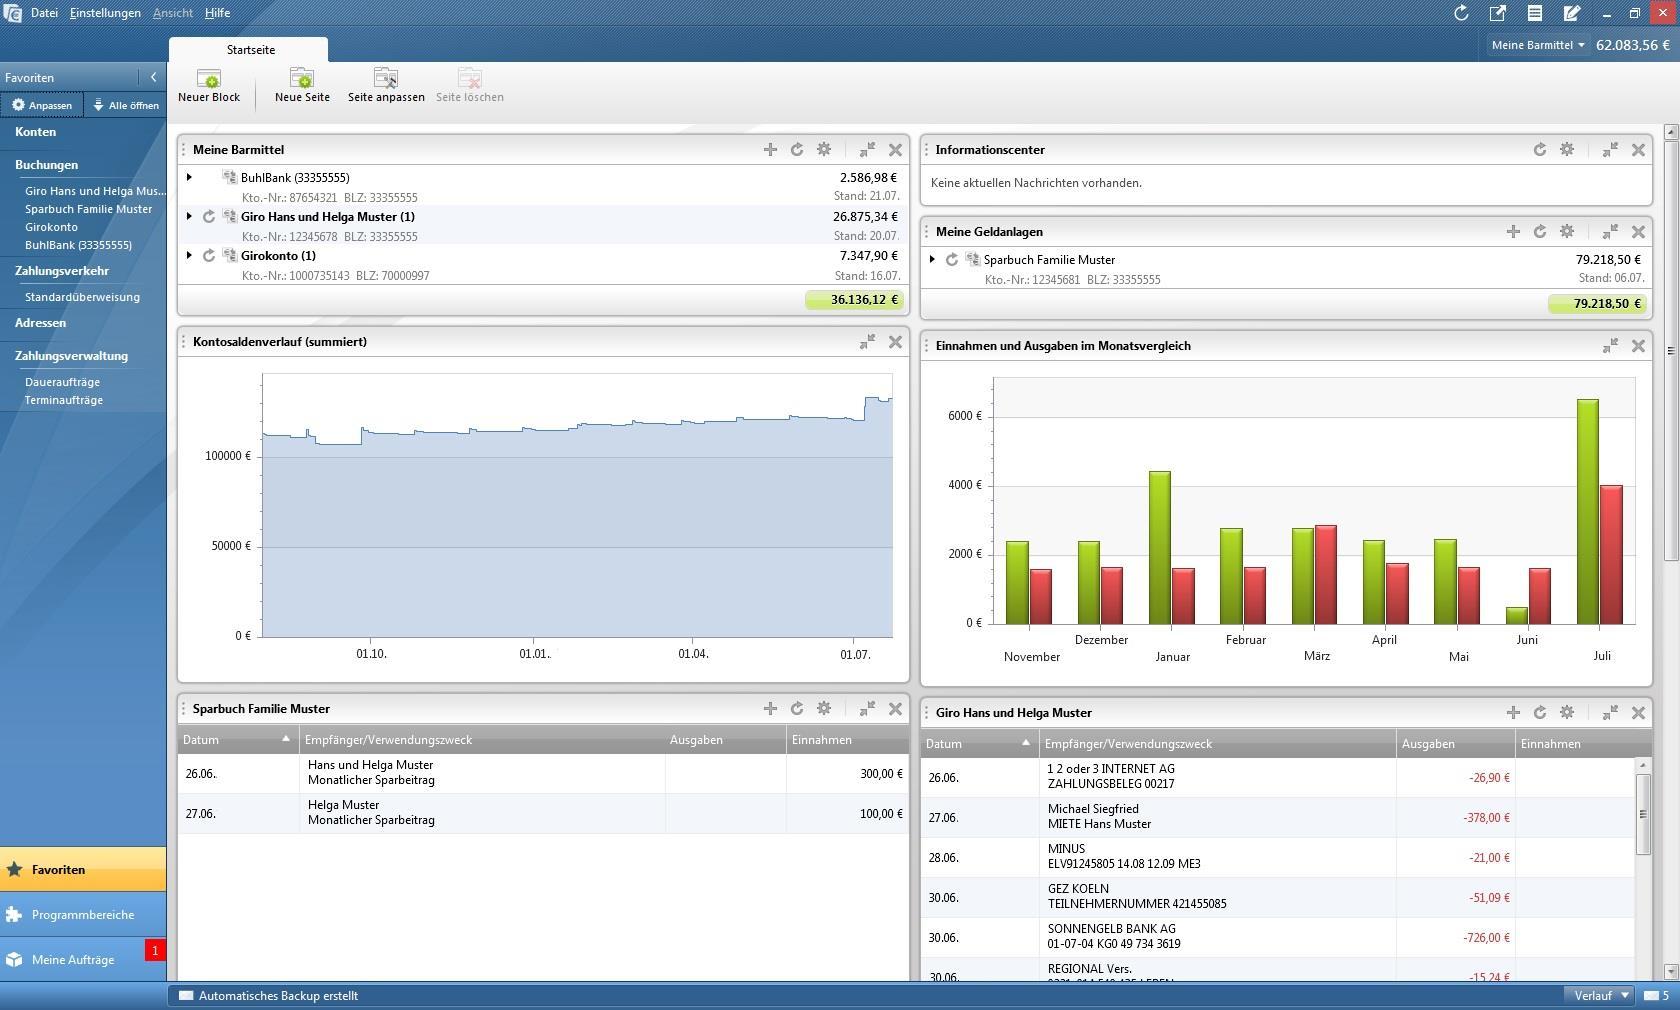 Buhl Data Service WISO Konto Online Plus 365 - ...